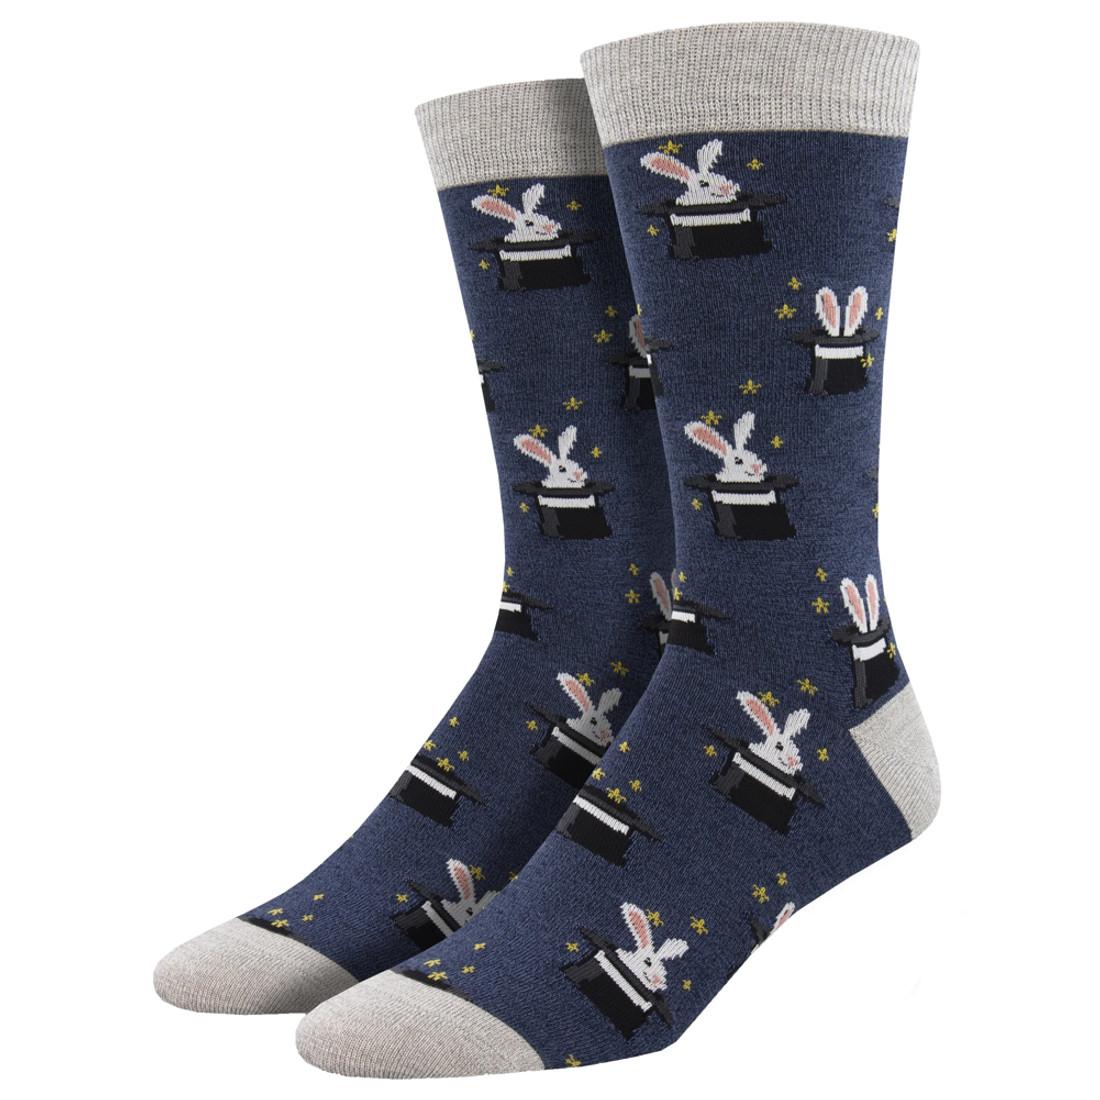 Tricky Rabbit Men's Bamboo Crew Socks